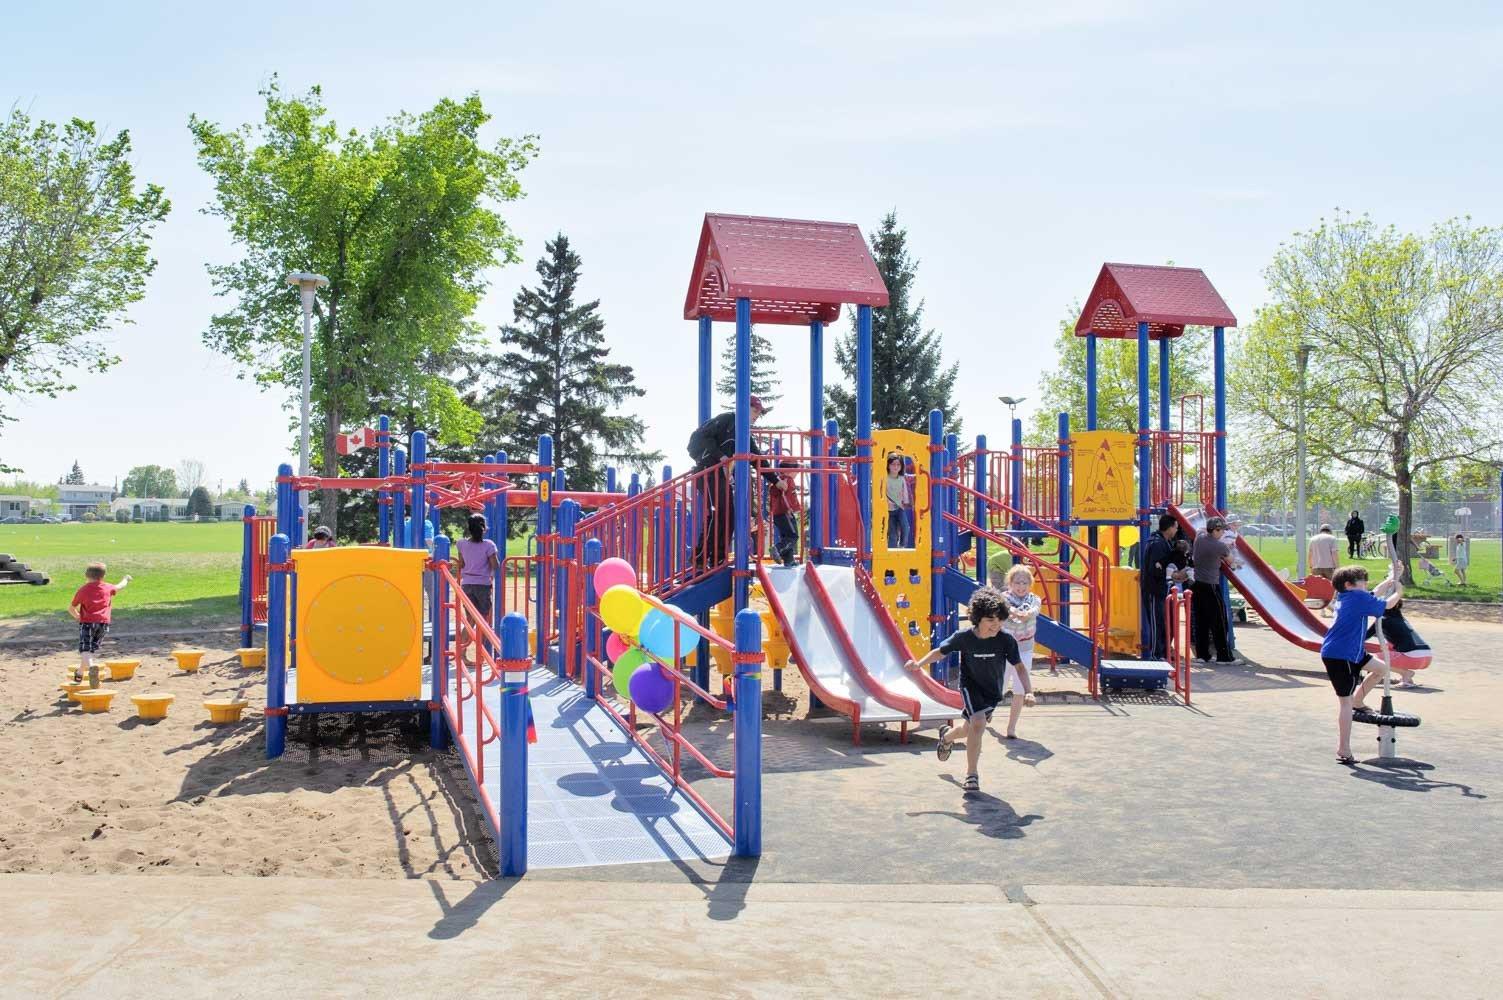 Elmwood Play Ground & Spray Park